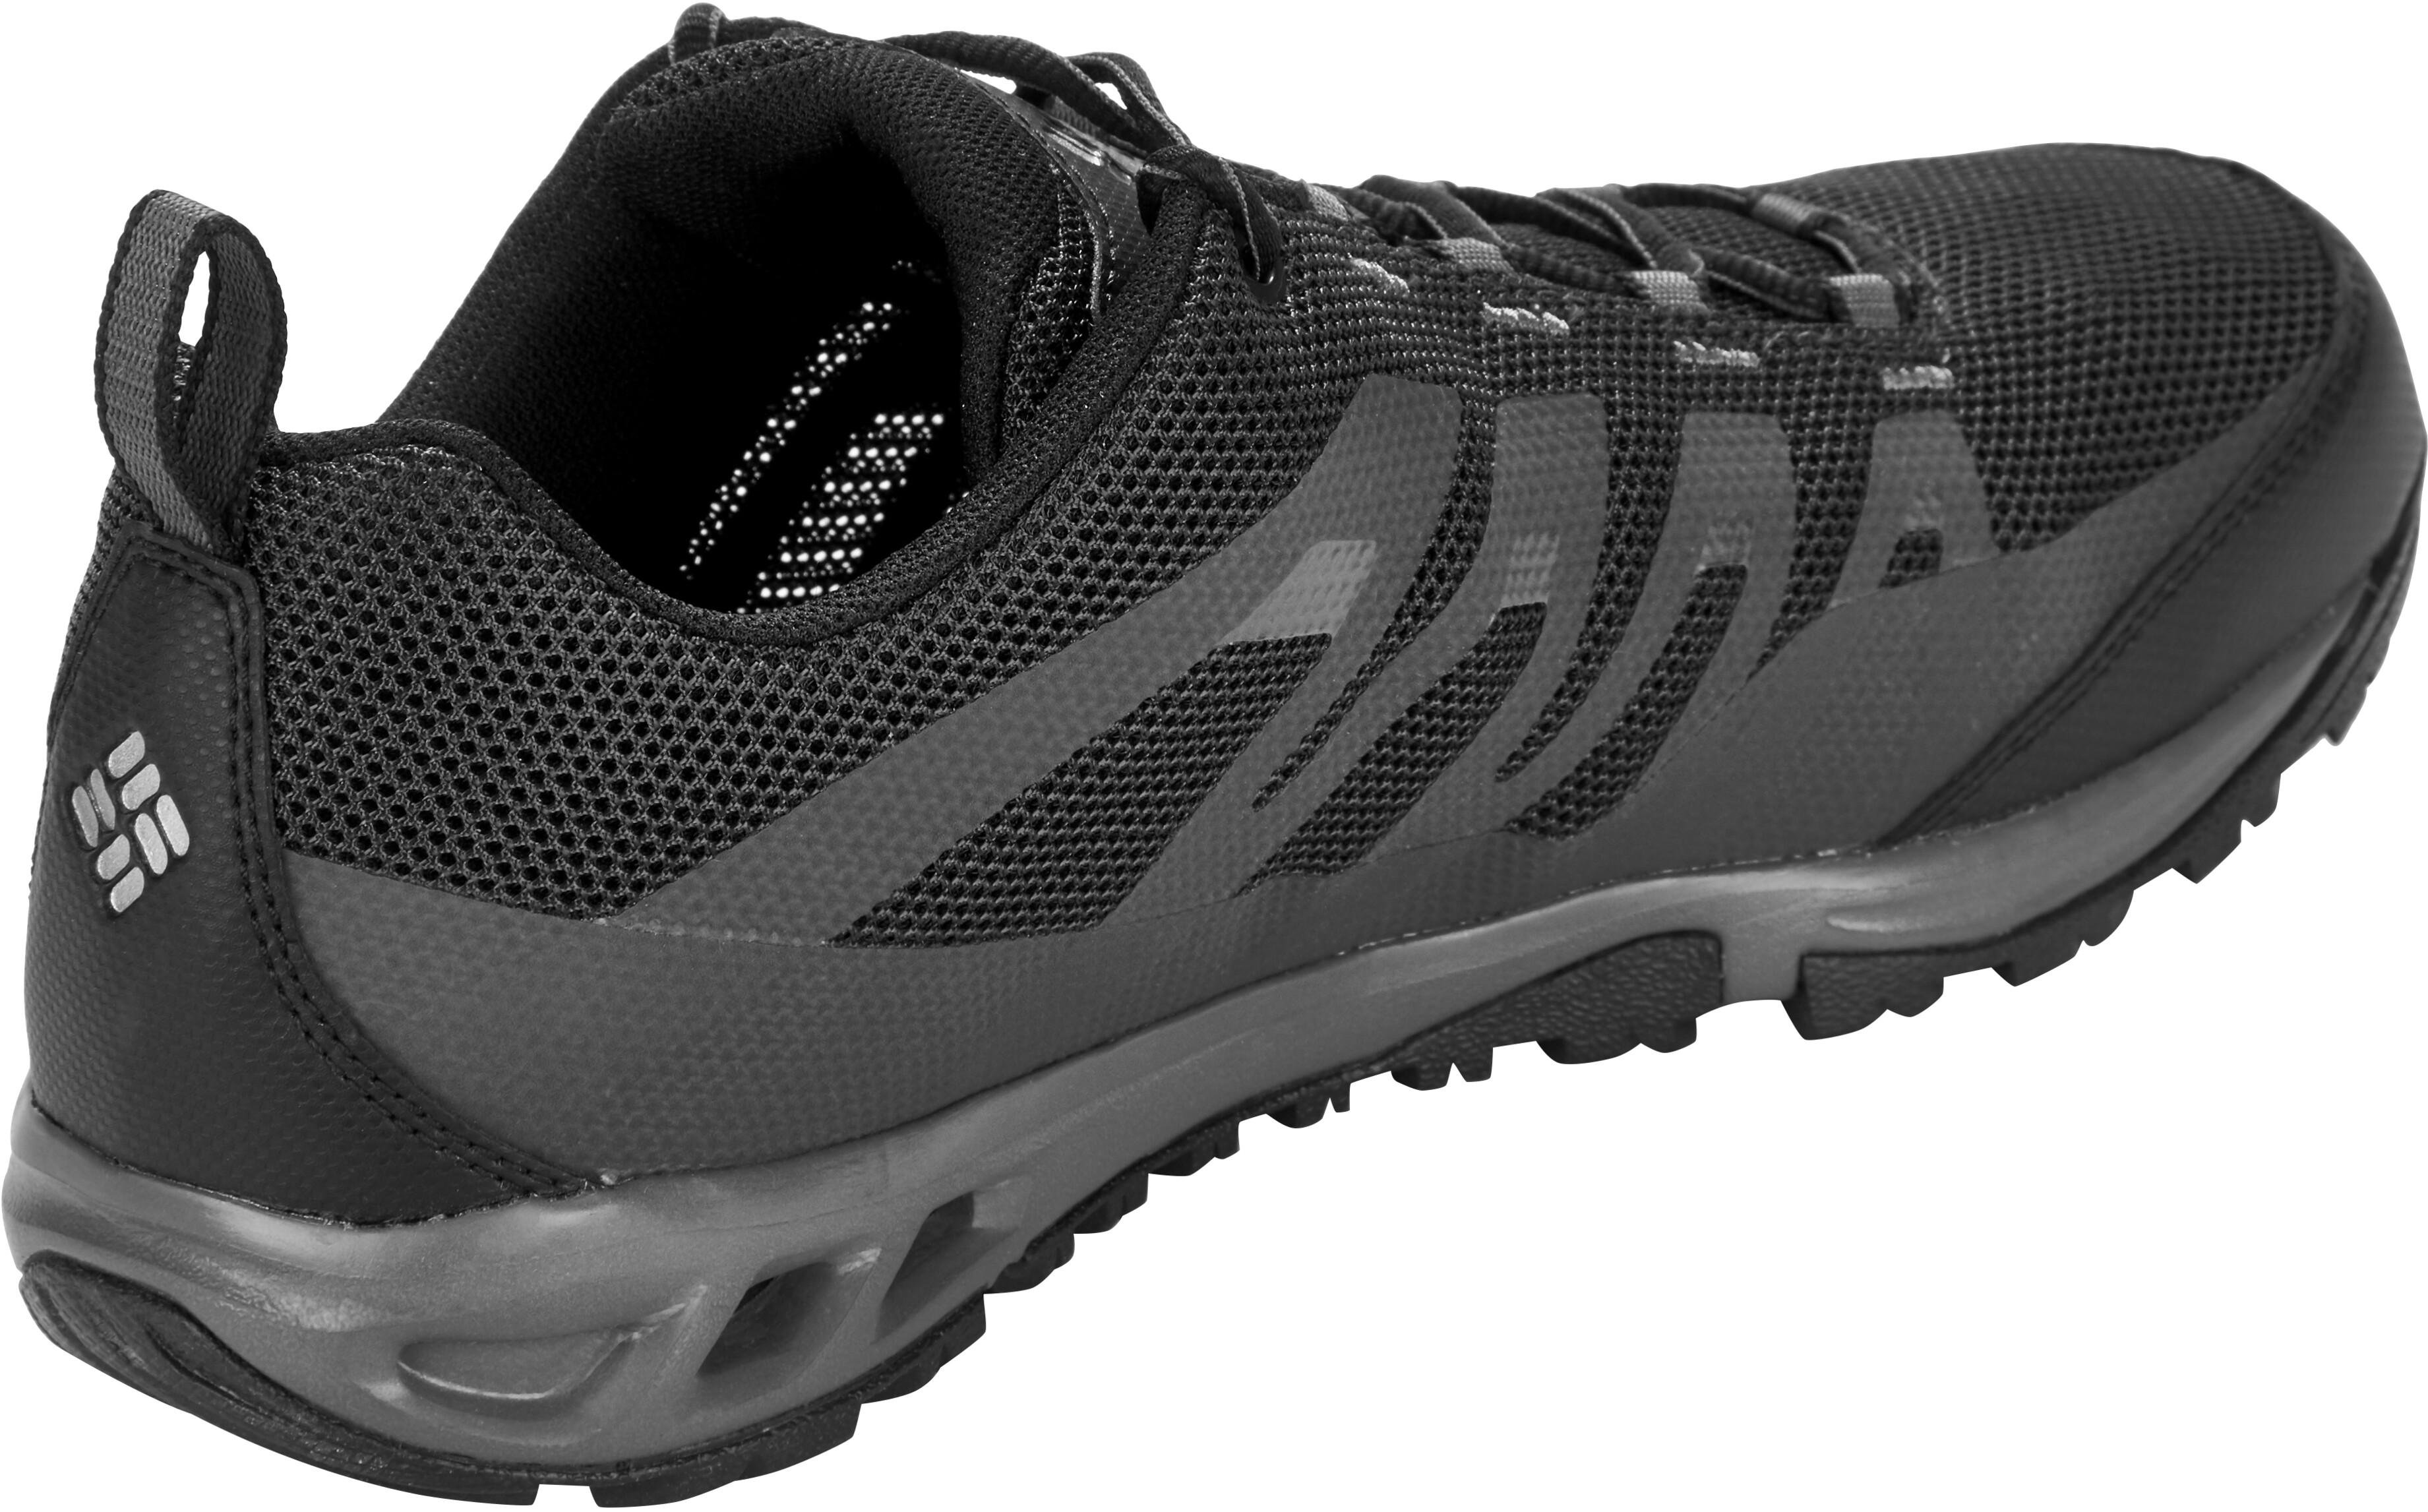 e2a64a7aebe8 Columbia Vapor Vent Shoes Men black at Addnature.co.uk